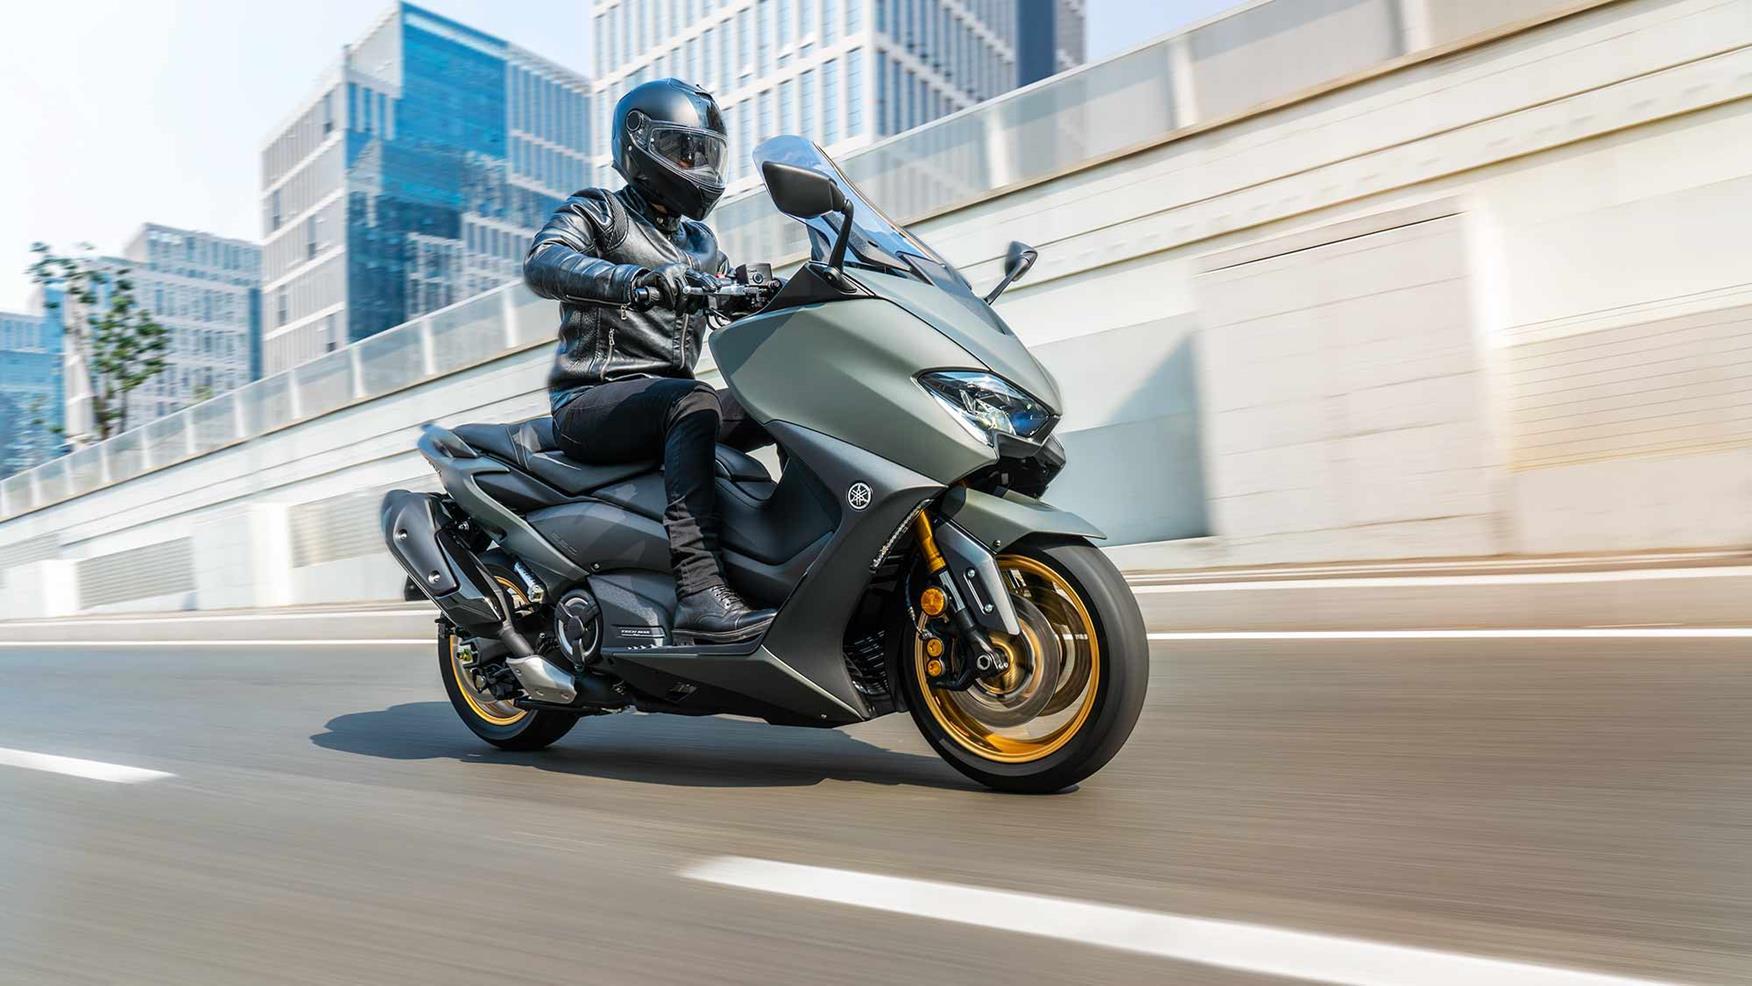 Yamaha TMAX Tech MAX inner-city riding